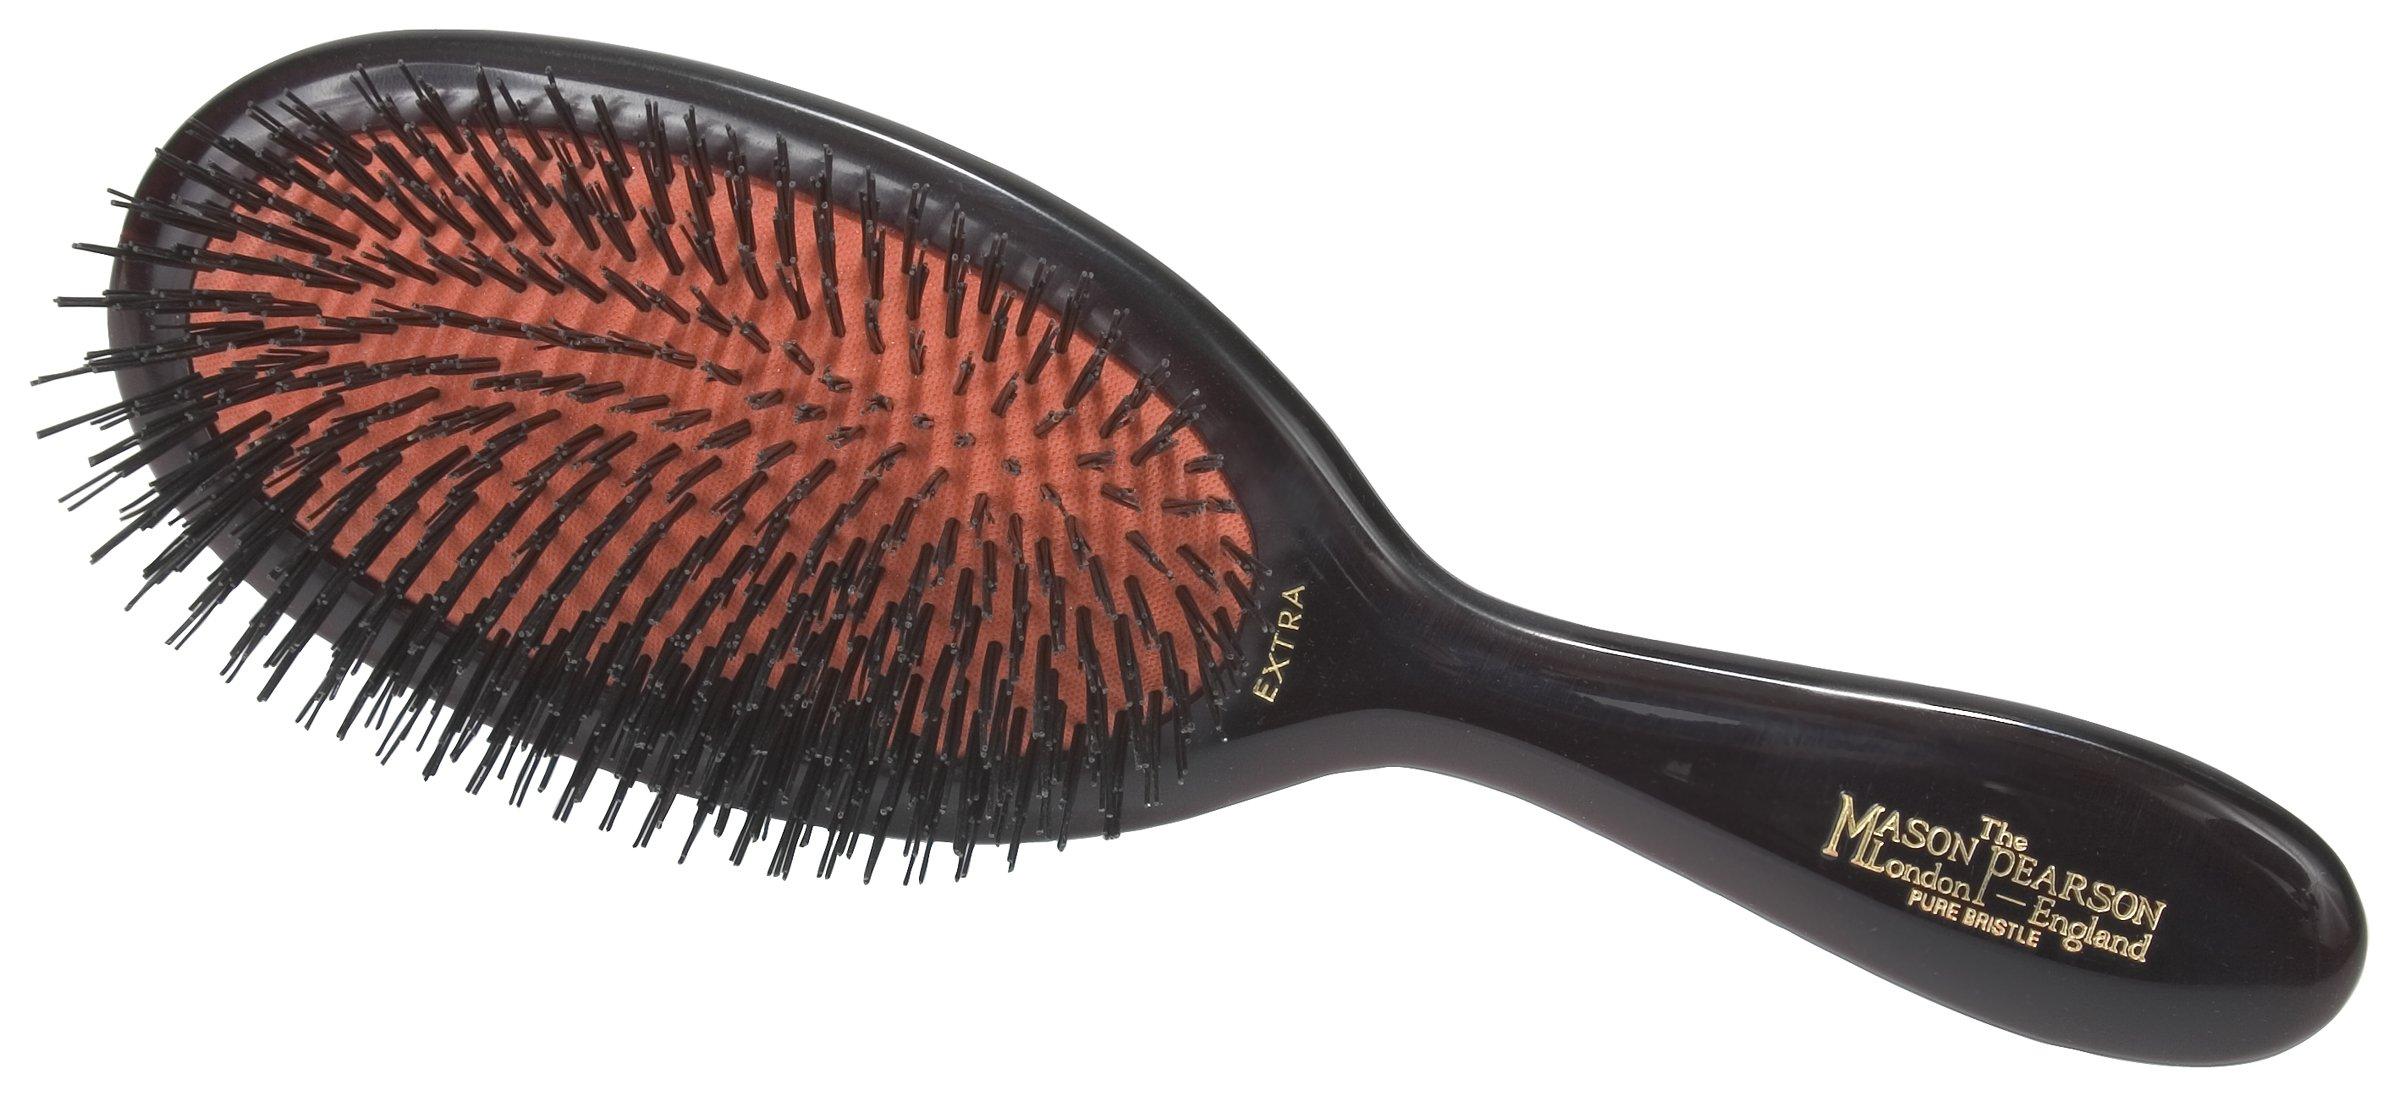 Mason Pearson Hairbrush